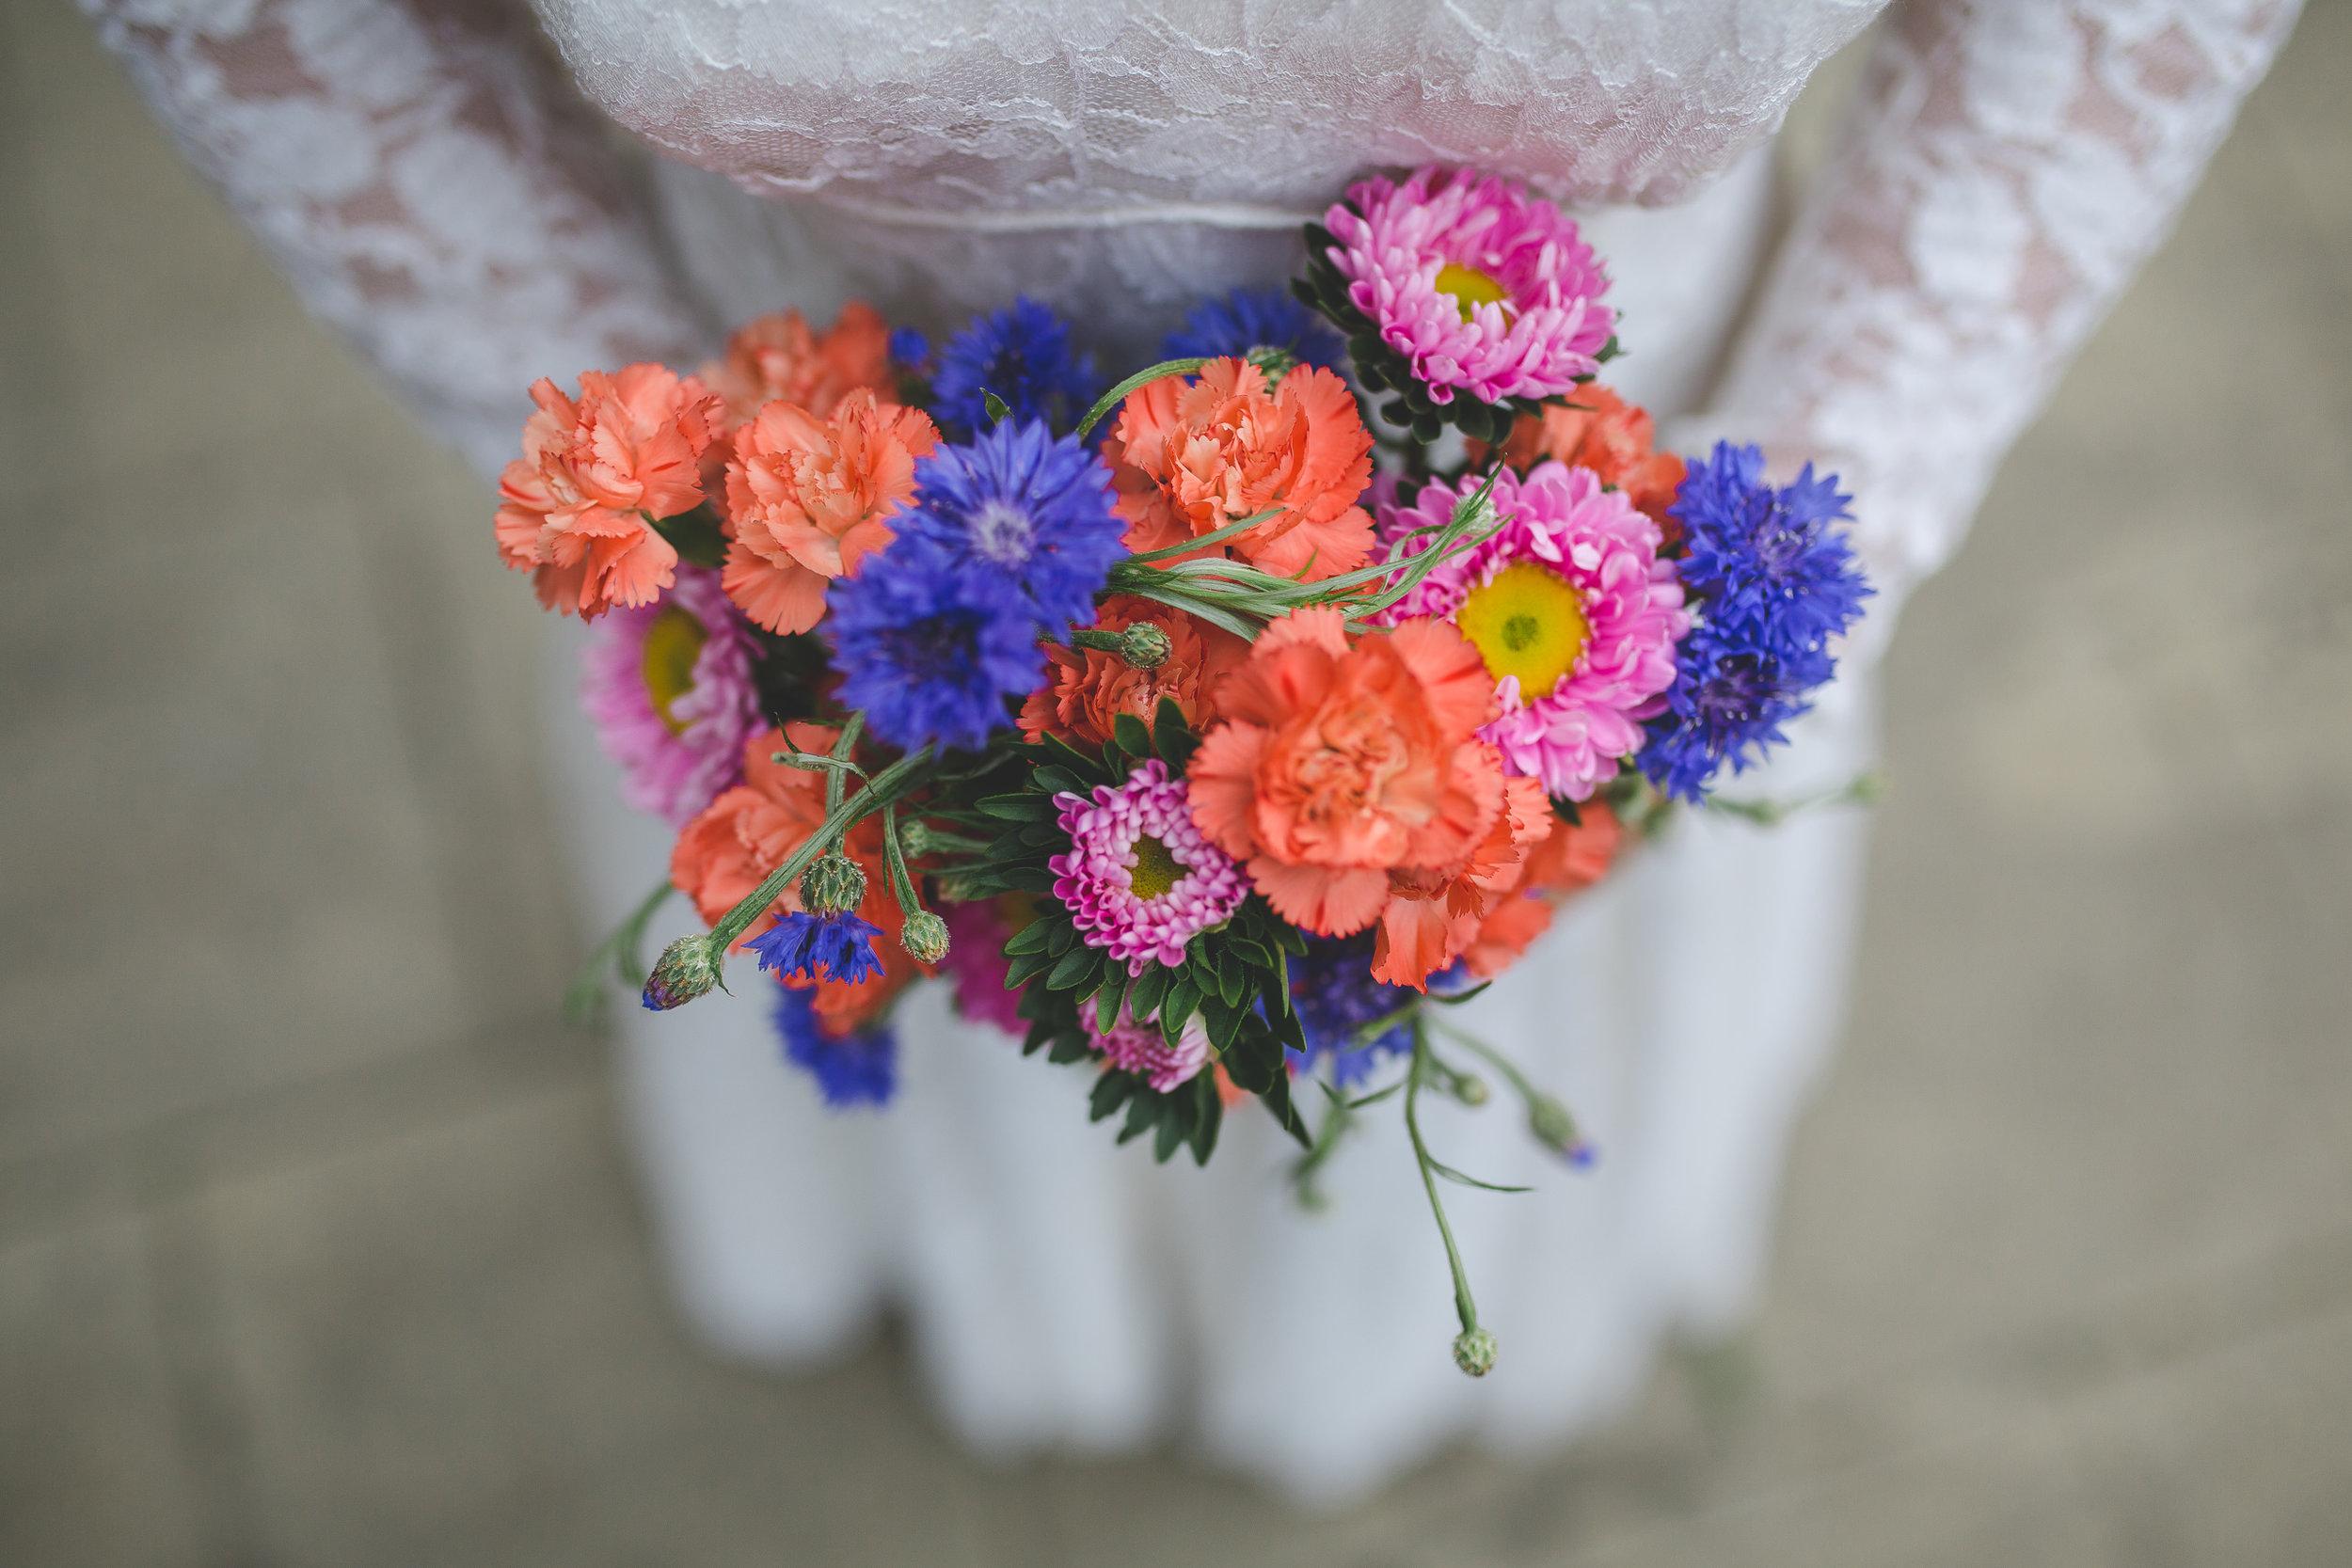 london-wedding-photographer-home-0009.jpg